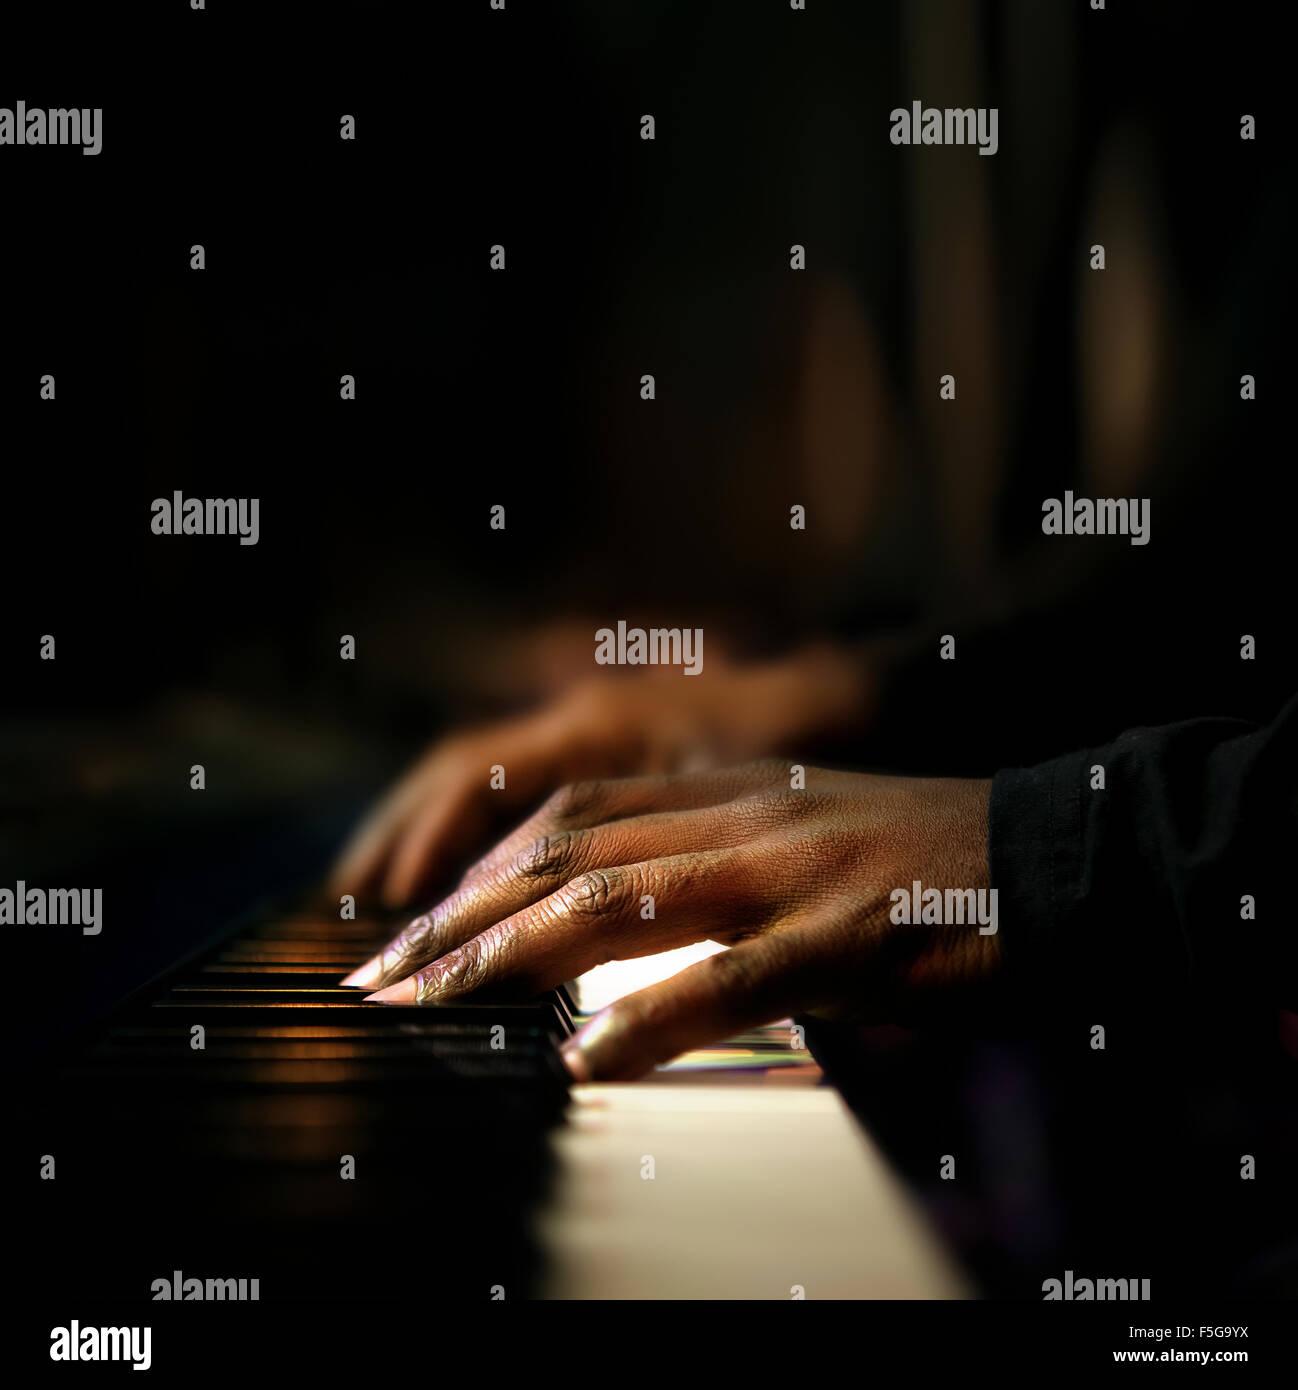 Manos de pianista tocando sintetizador de cerca Imagen De Stock